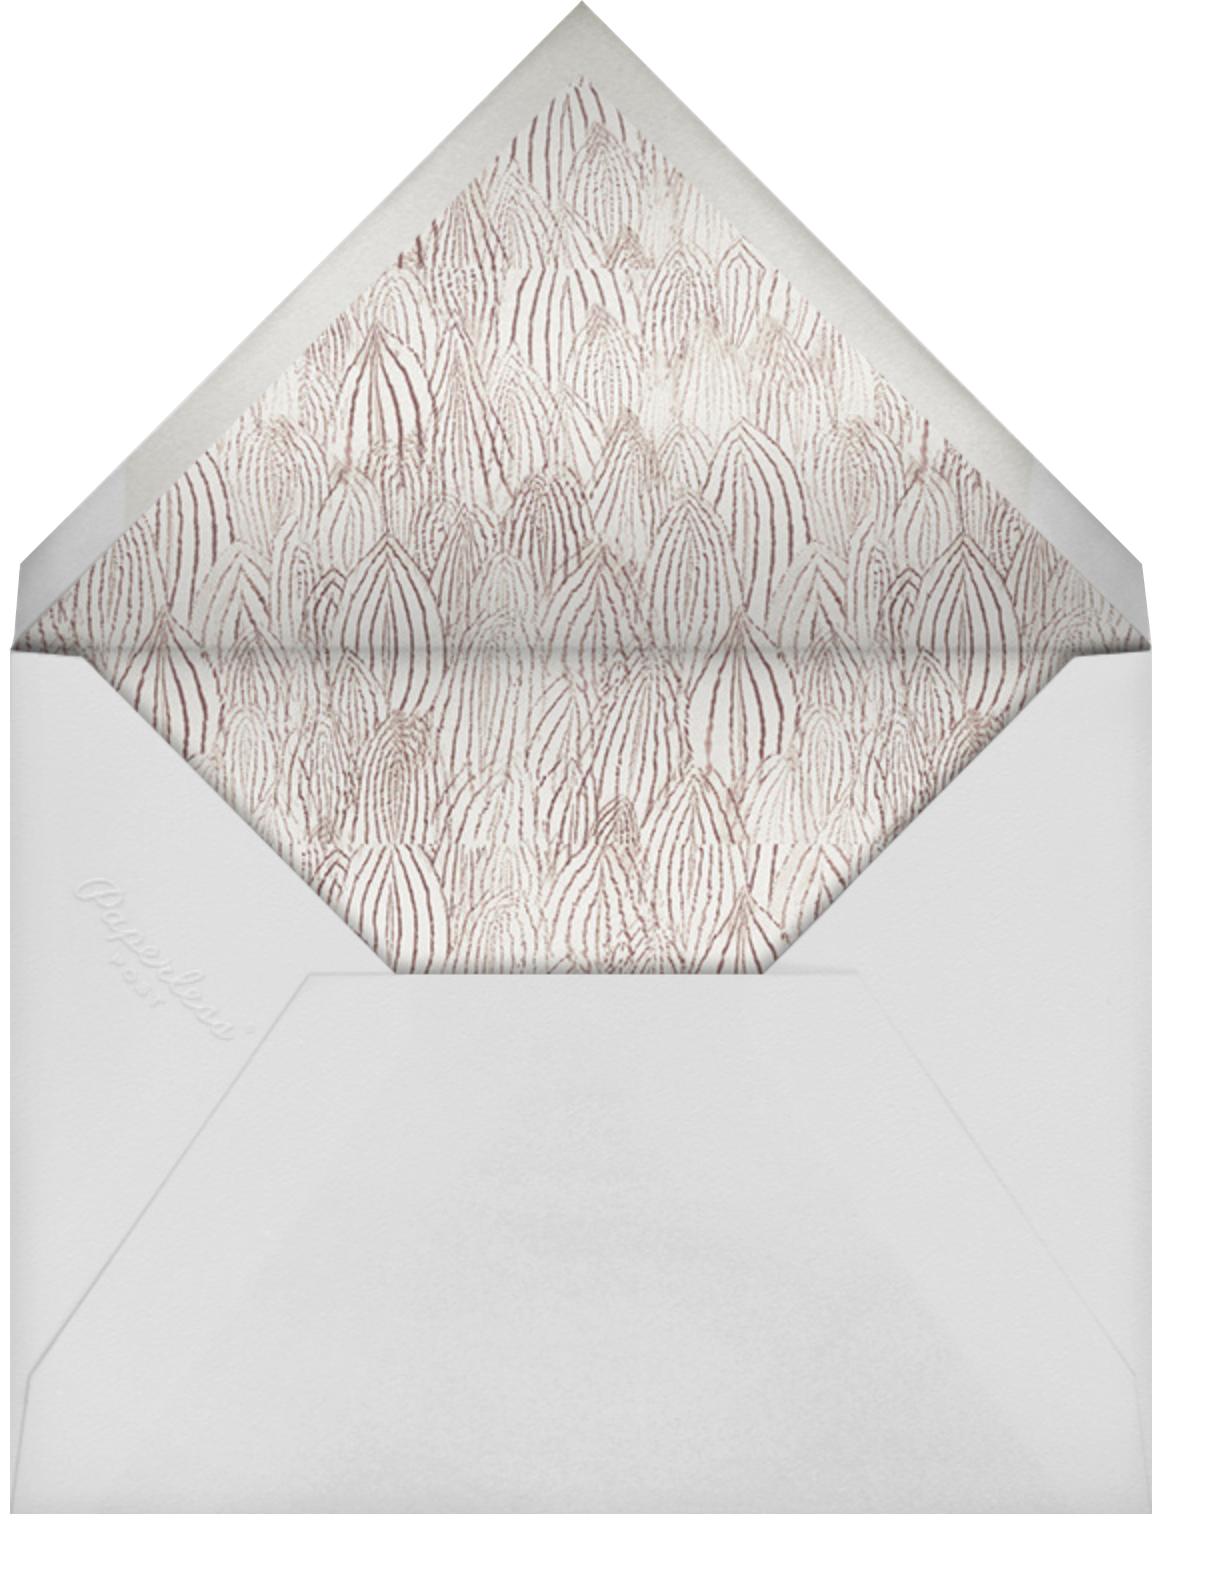 Chic Minimalism - Schumacher - Casual entertaining - envelope back